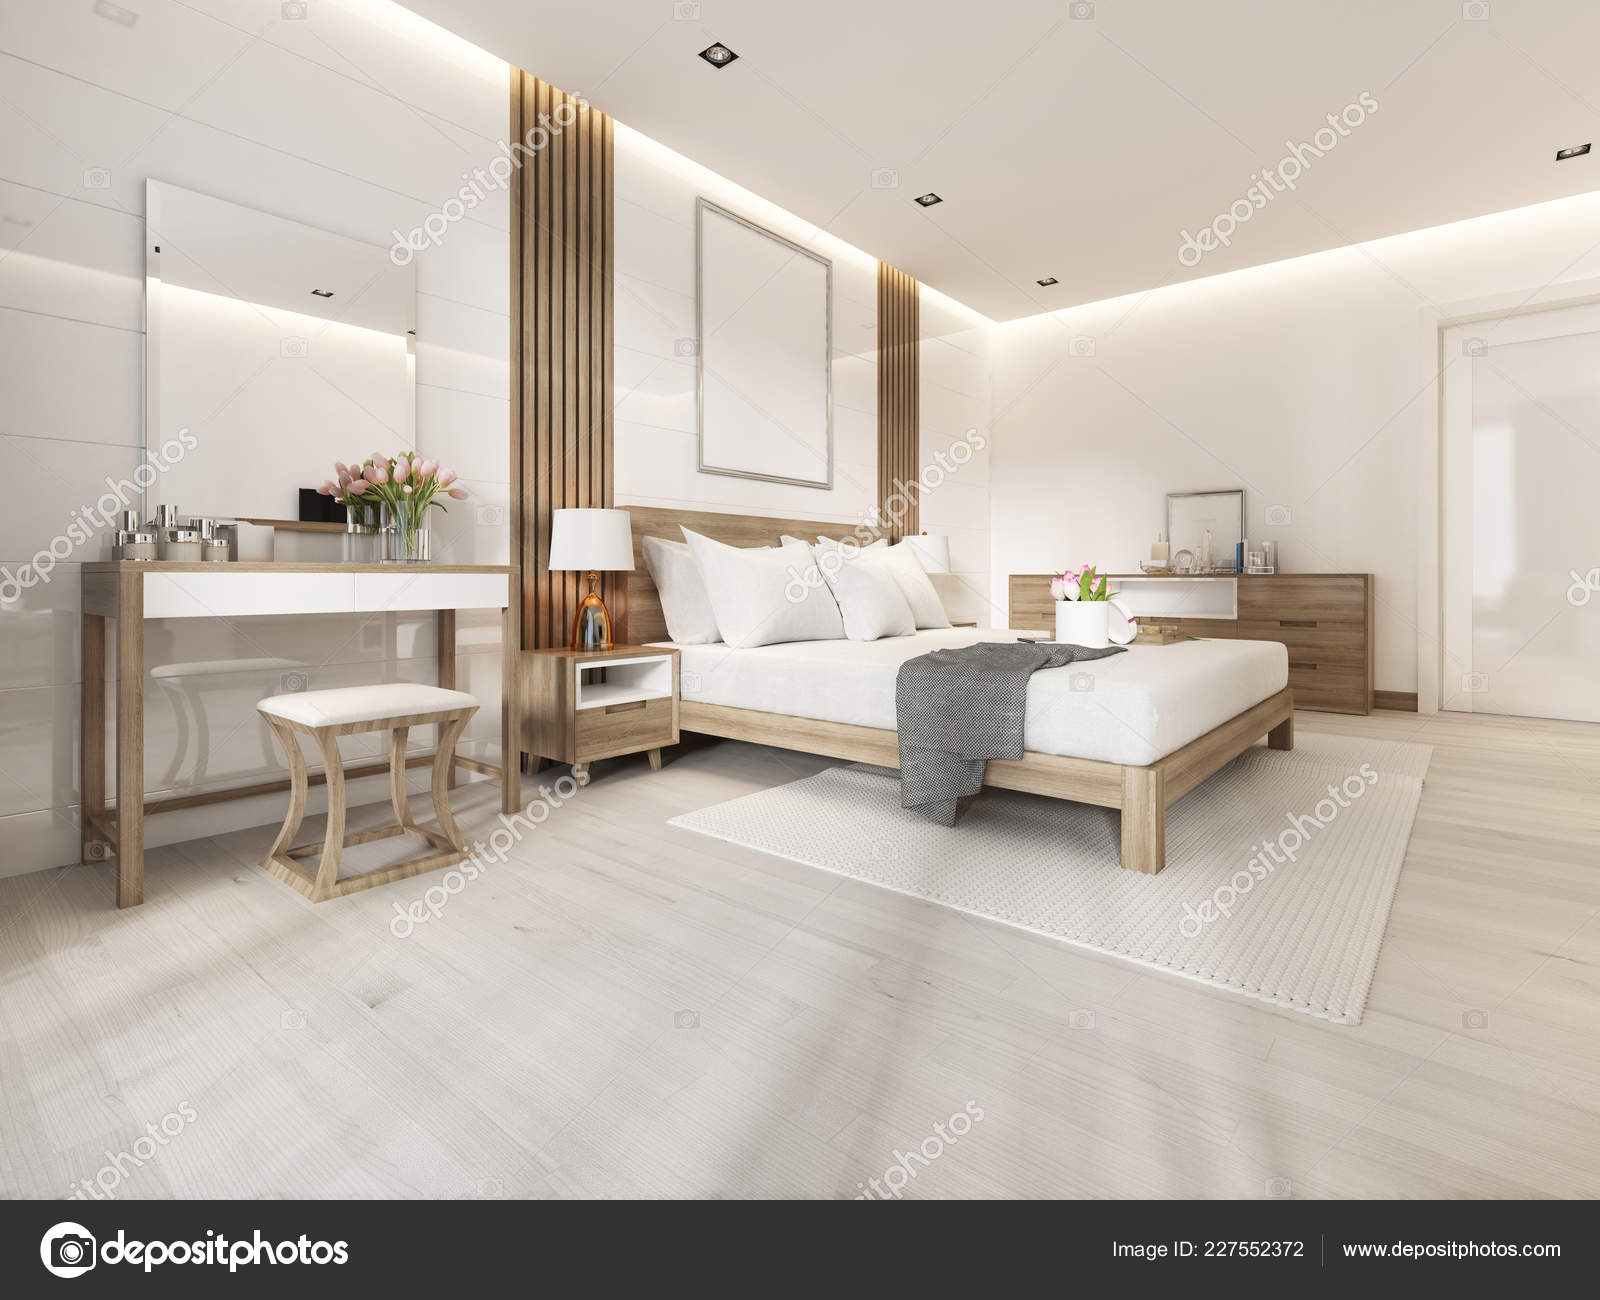 Modern Light Bedroom Wooden Furniture Scandinavian Style Rendering Stock Photo Image By C Kuprin33 227552372